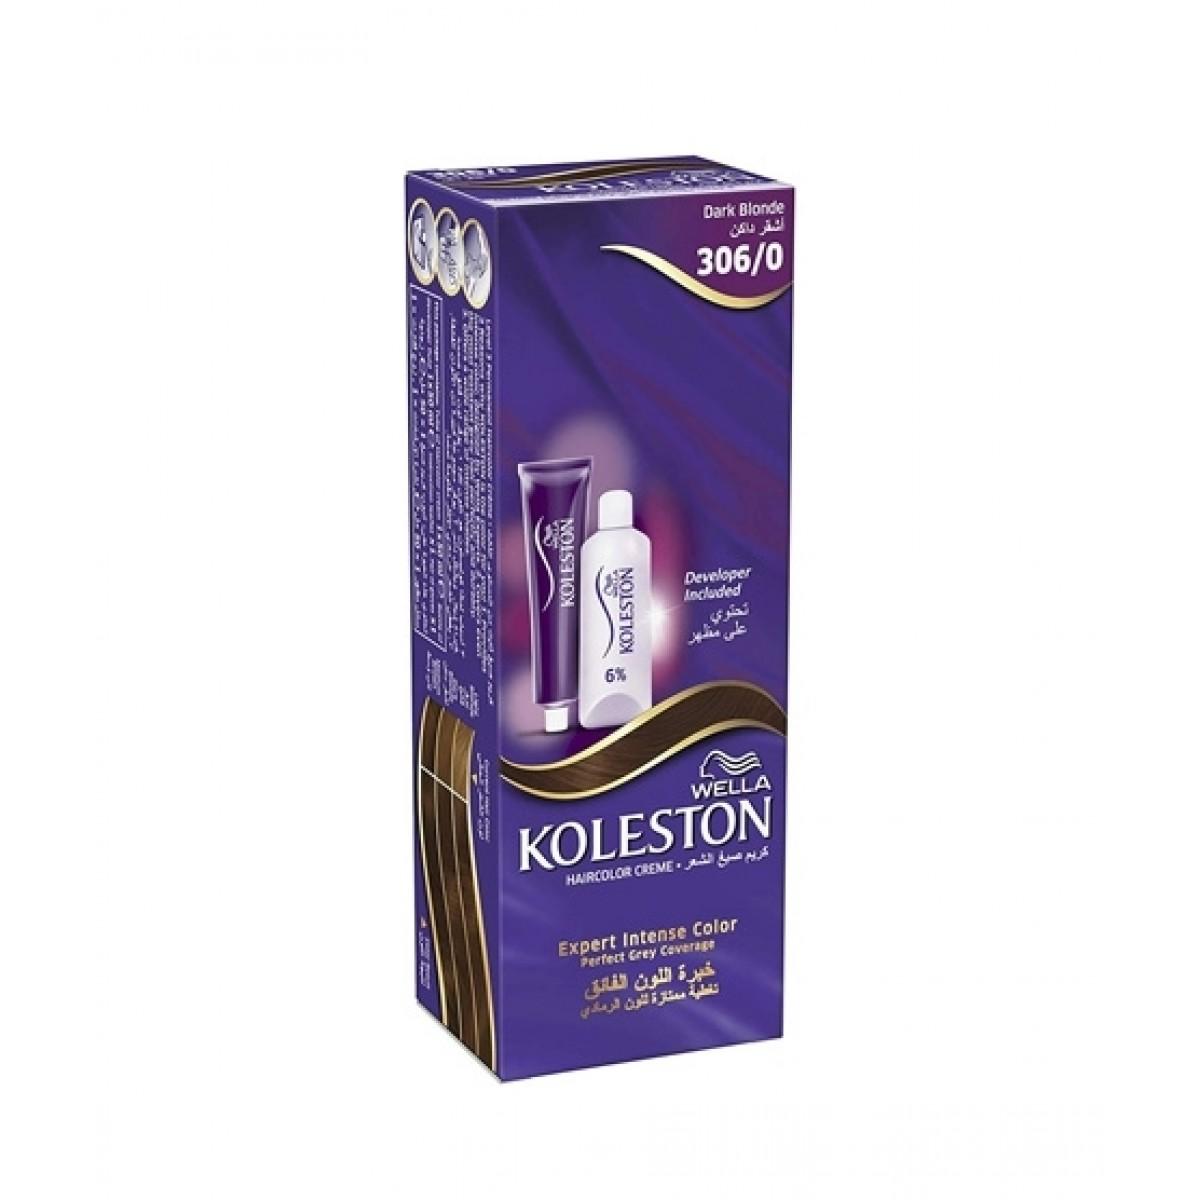 Wella Koleston Hair Color 306/0 Dark Blonde 100ml